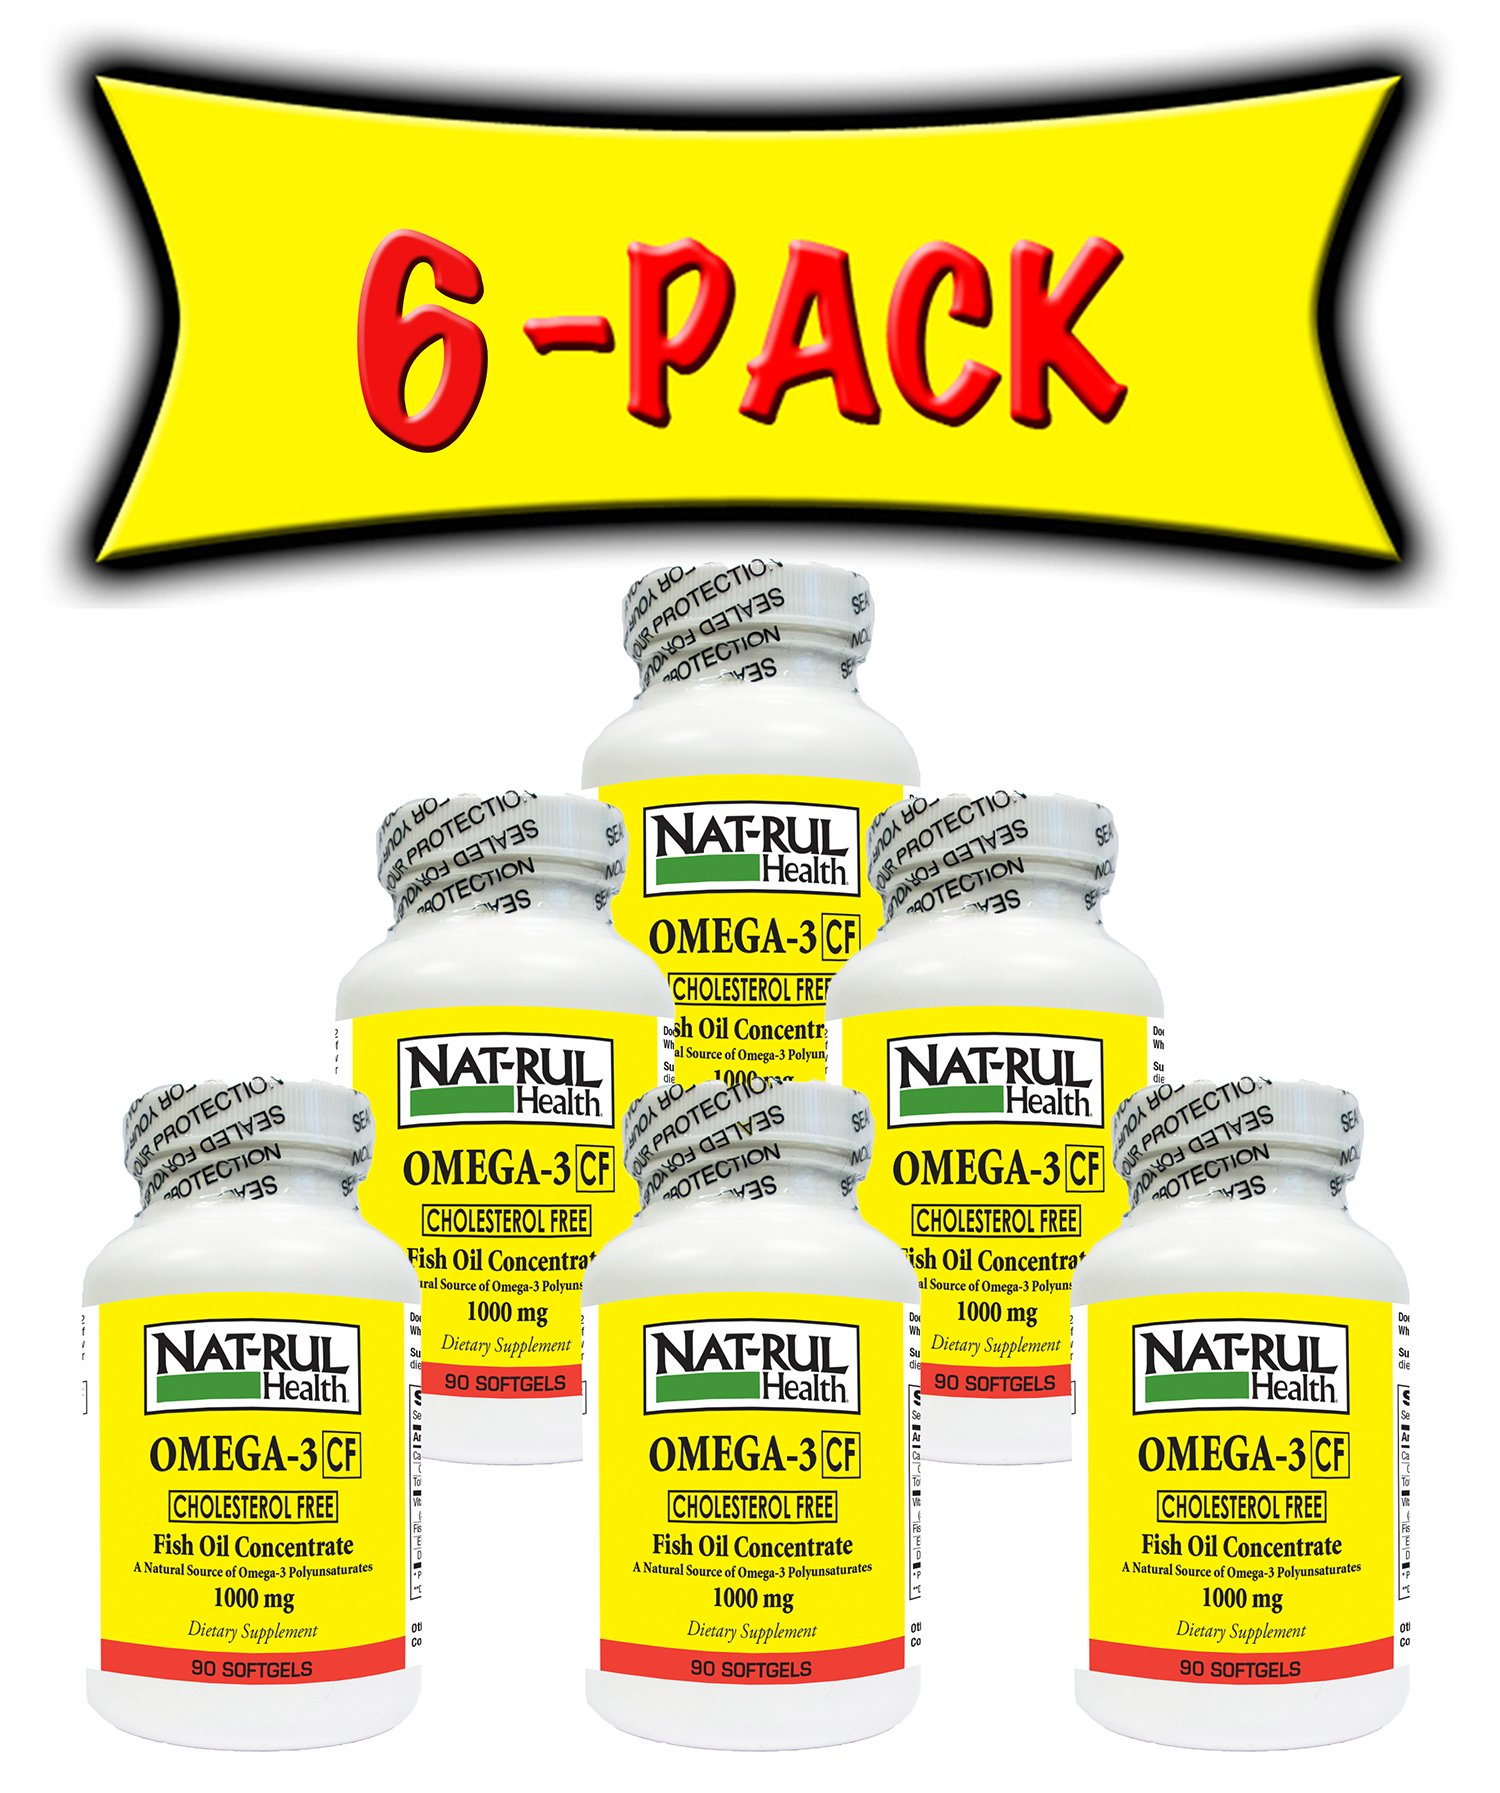 Nat-rul Health Omega 3 Cholesterol Free 100mg 90 Softgels - 6 PACK